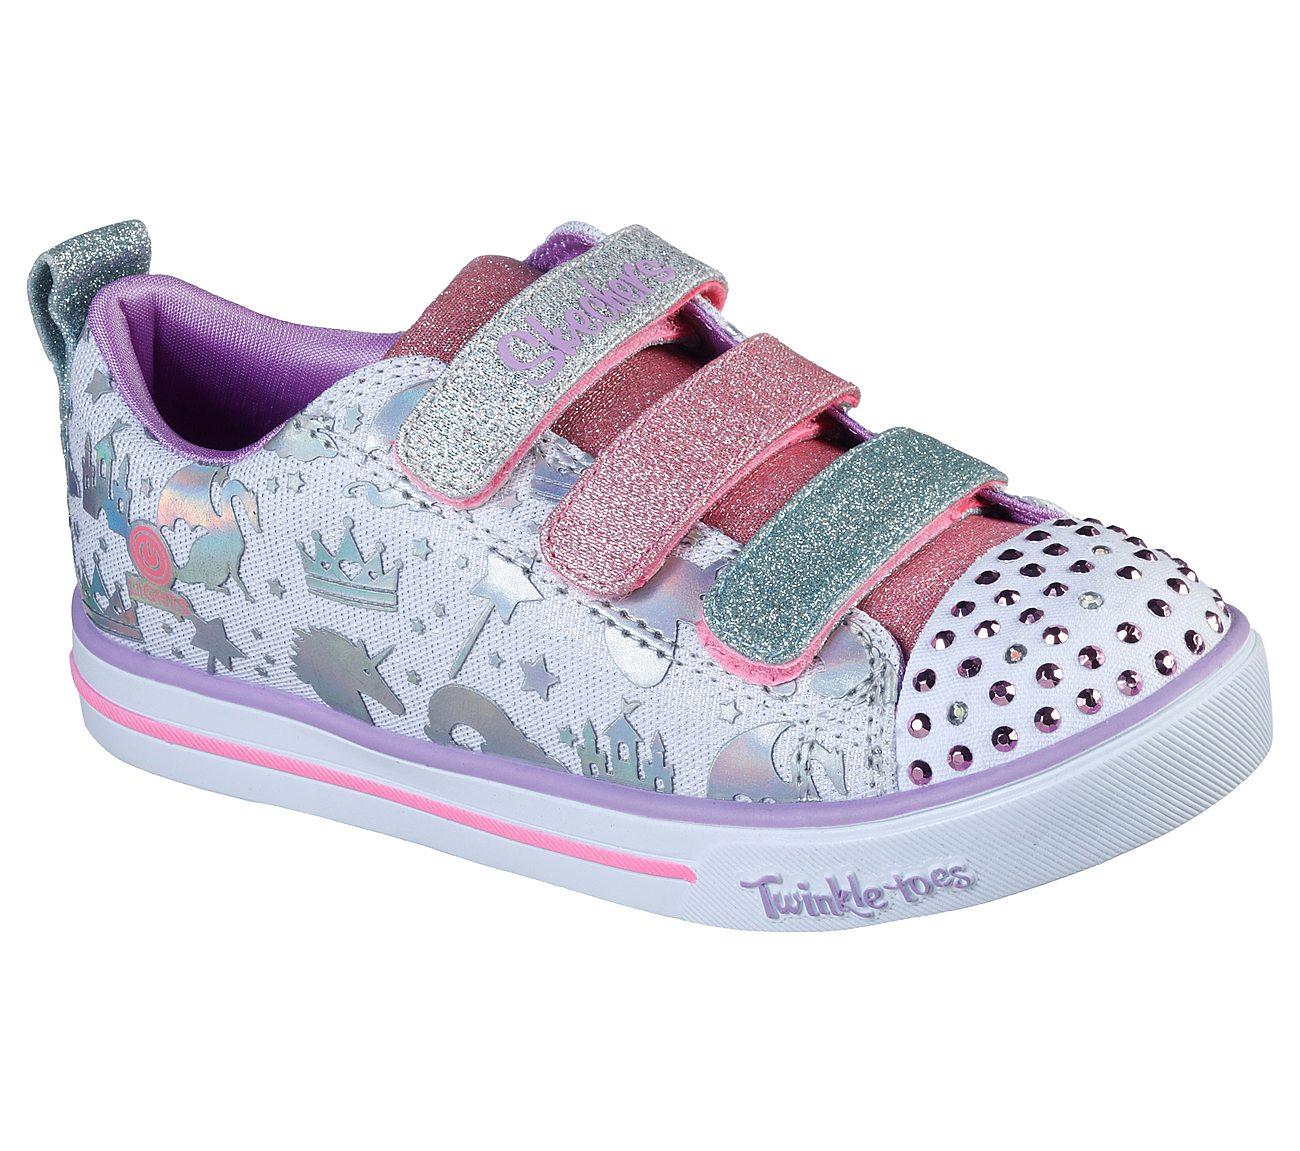 Twinkle Toes: Sparkle Lite Sparkleland